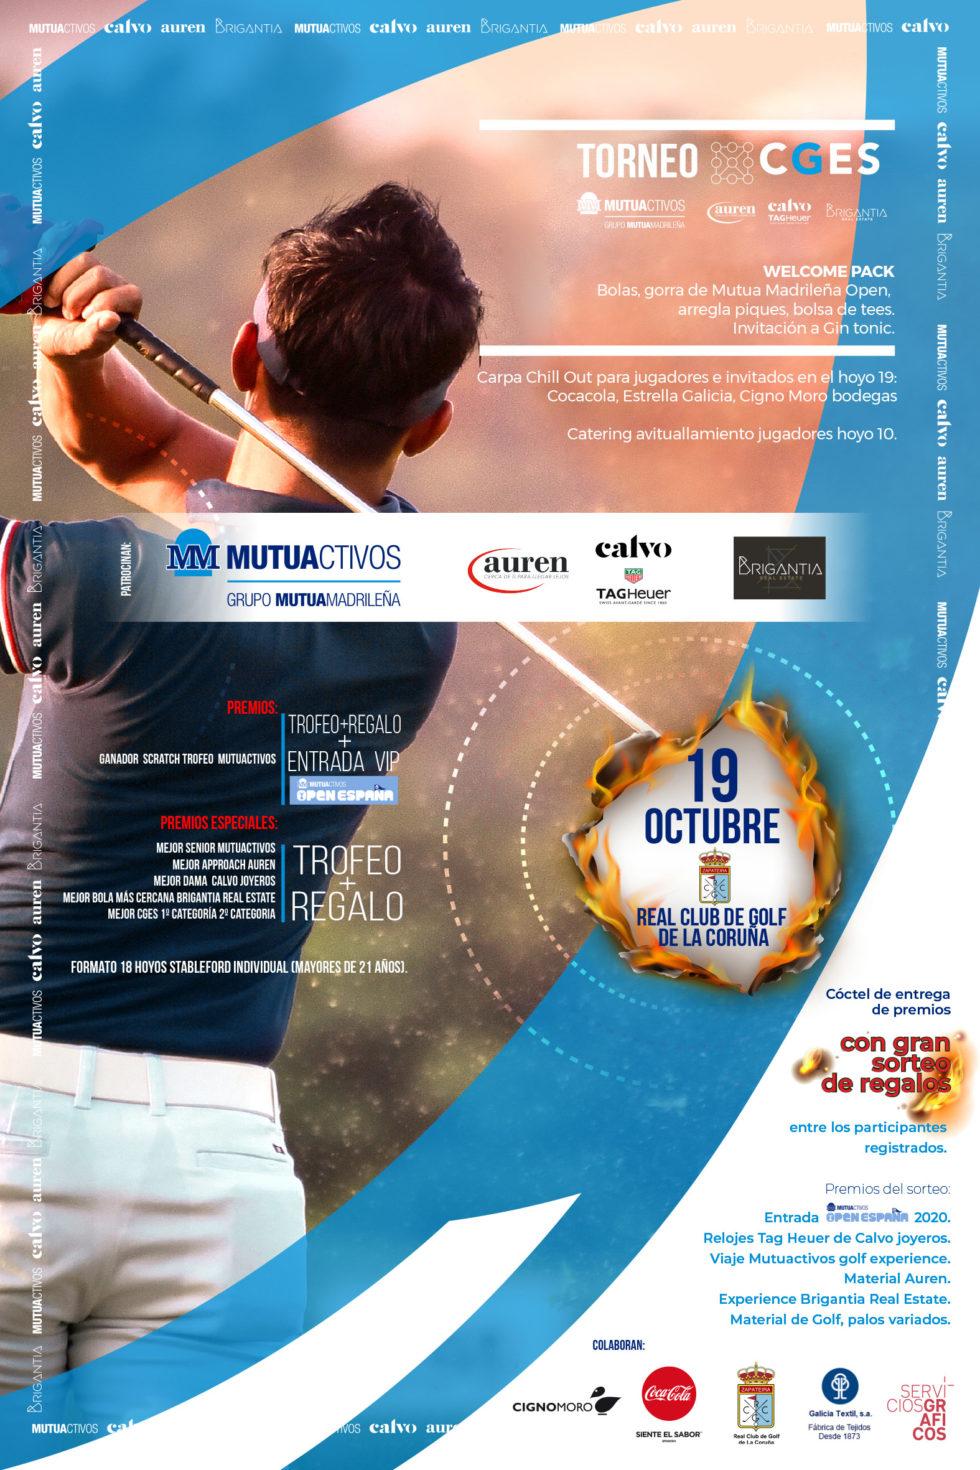 torneo-golf-cges-2019.jpg